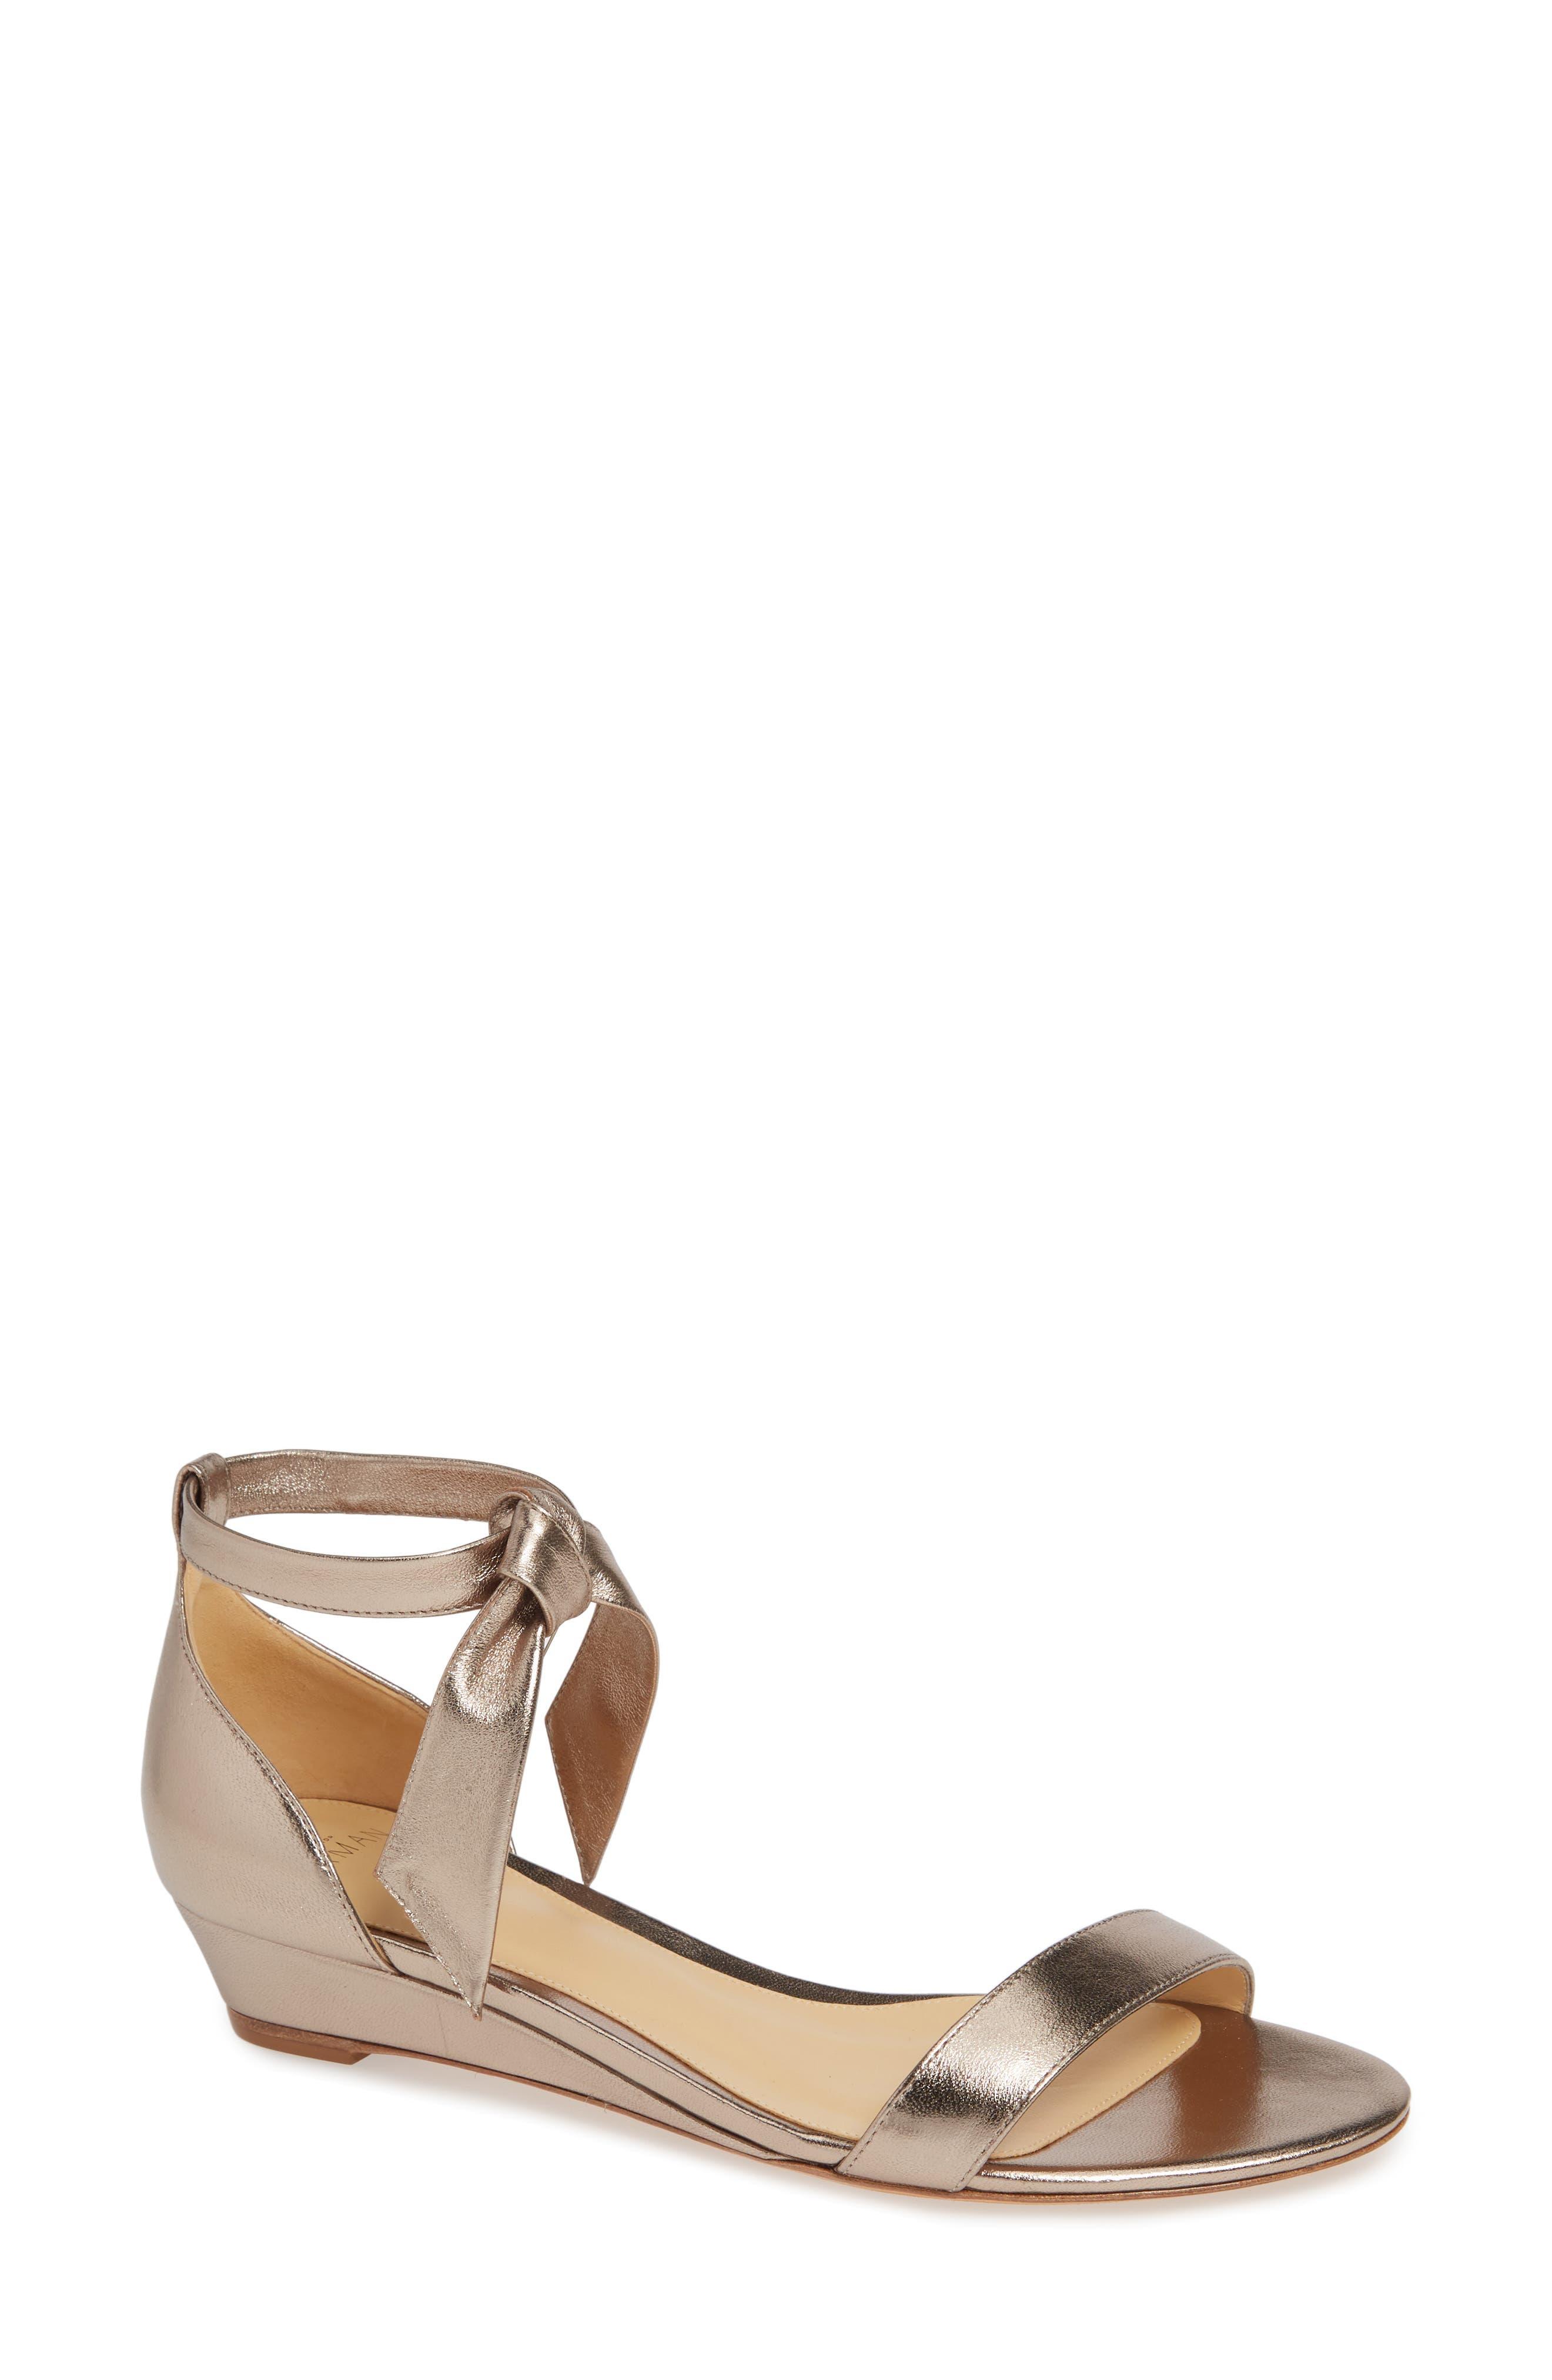 Alexandre Birman Clarita Wedge Sandal, Metallic